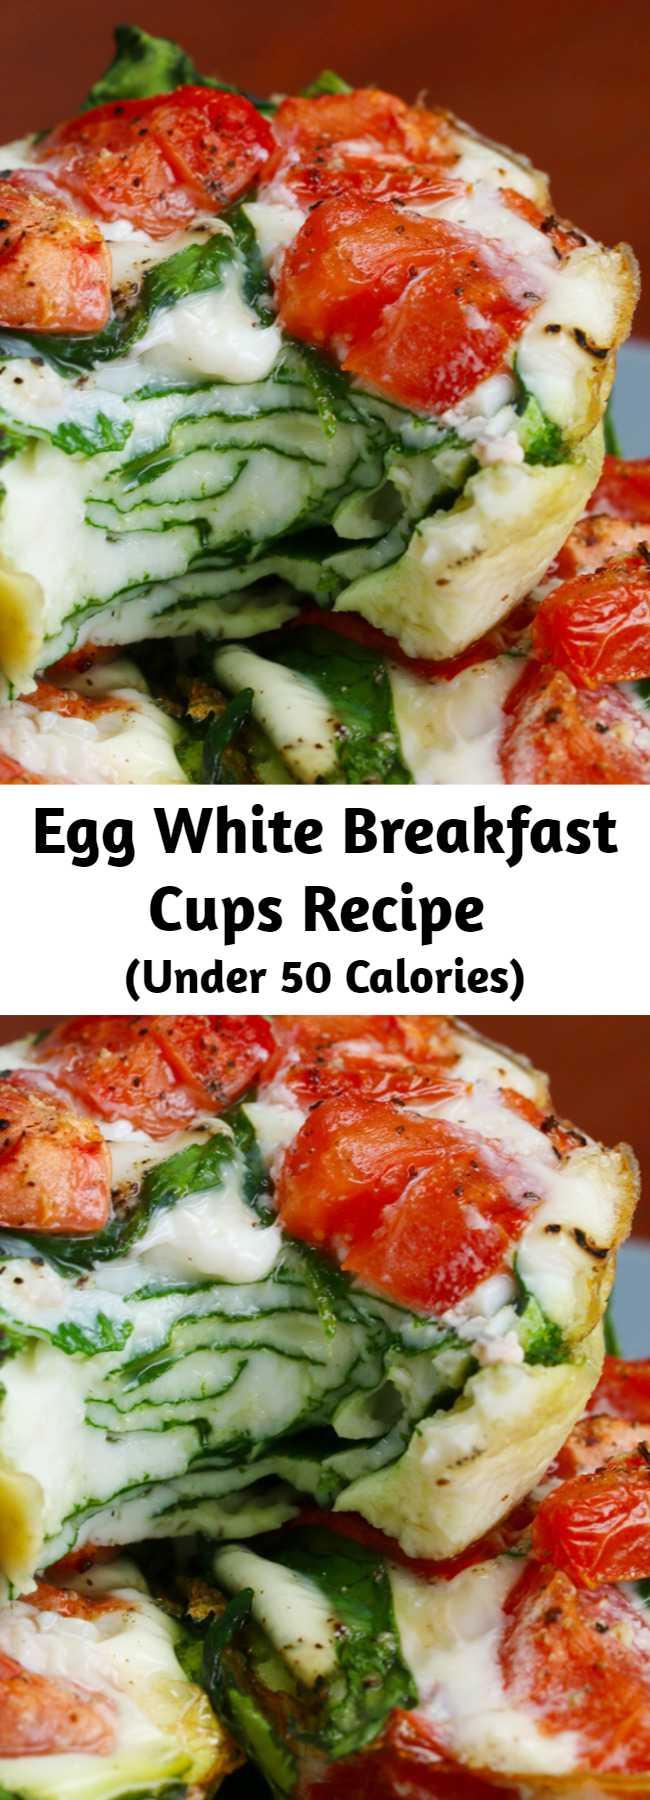 Egg White Breakfast Cups Recipe - Vegetarian · Gluten free · Paleo · Serves 6 · Egg White Breakfast Cups